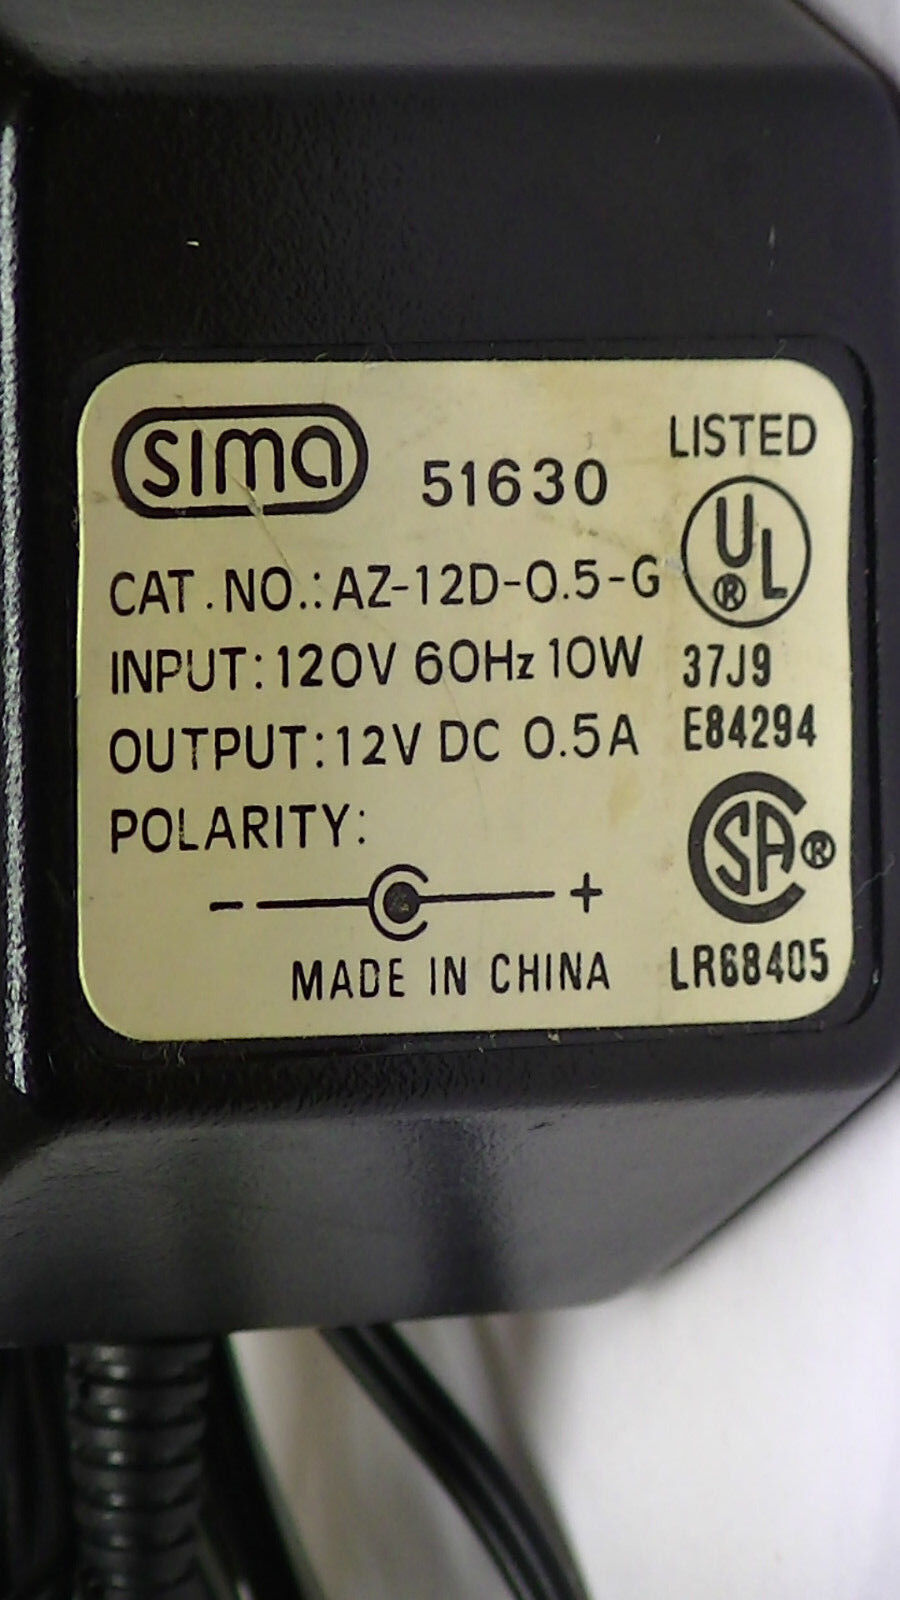 AC-Adapter-Sima-Model-51630-AZ-12D-0.5-G-Output-12vdc-0.5A